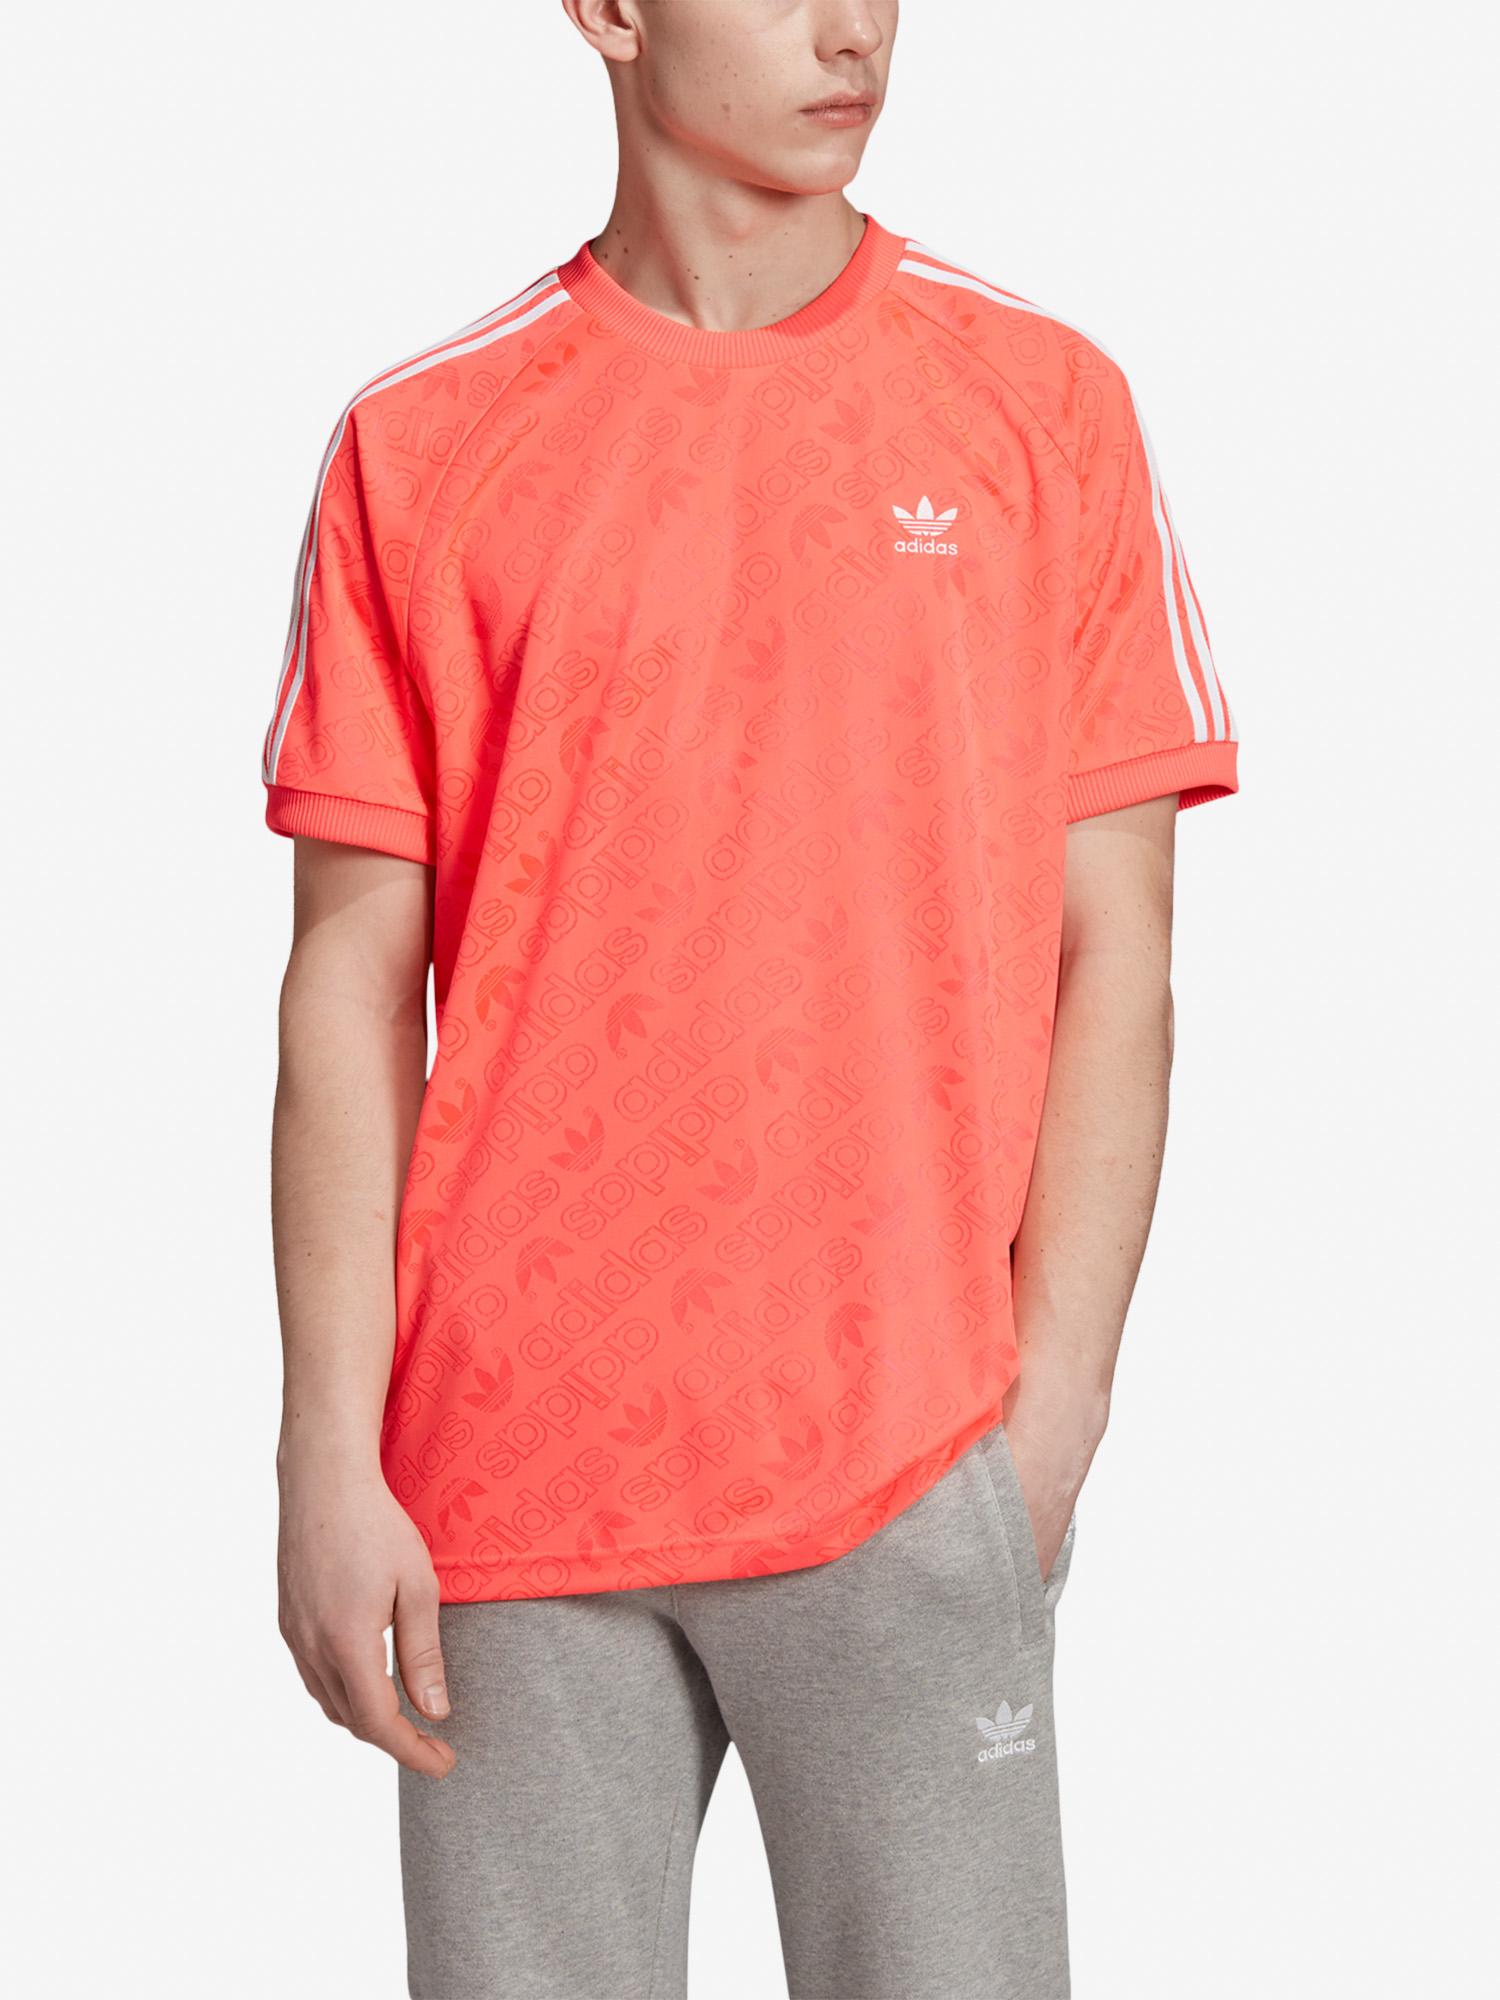 Adidas Originals Mono Jersey T-shirt